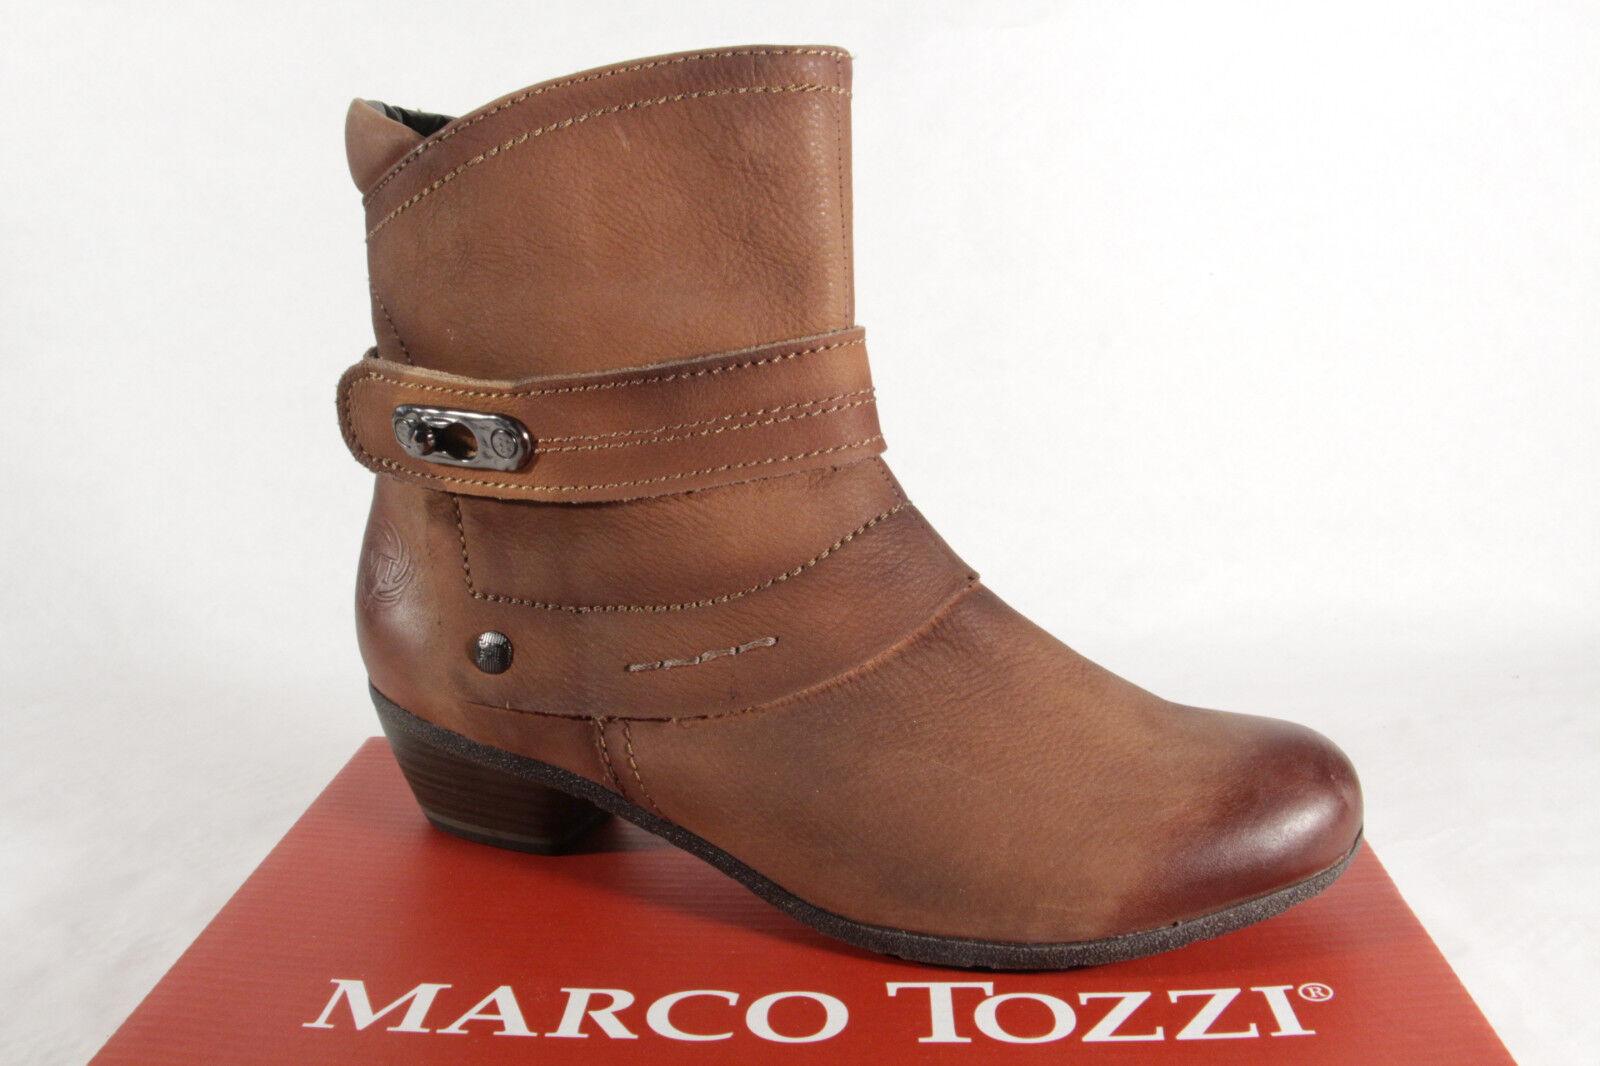 Marco Tozzi 25356 Damen Stiefel Stiefeletten Stiefel Echtleder braun NEU